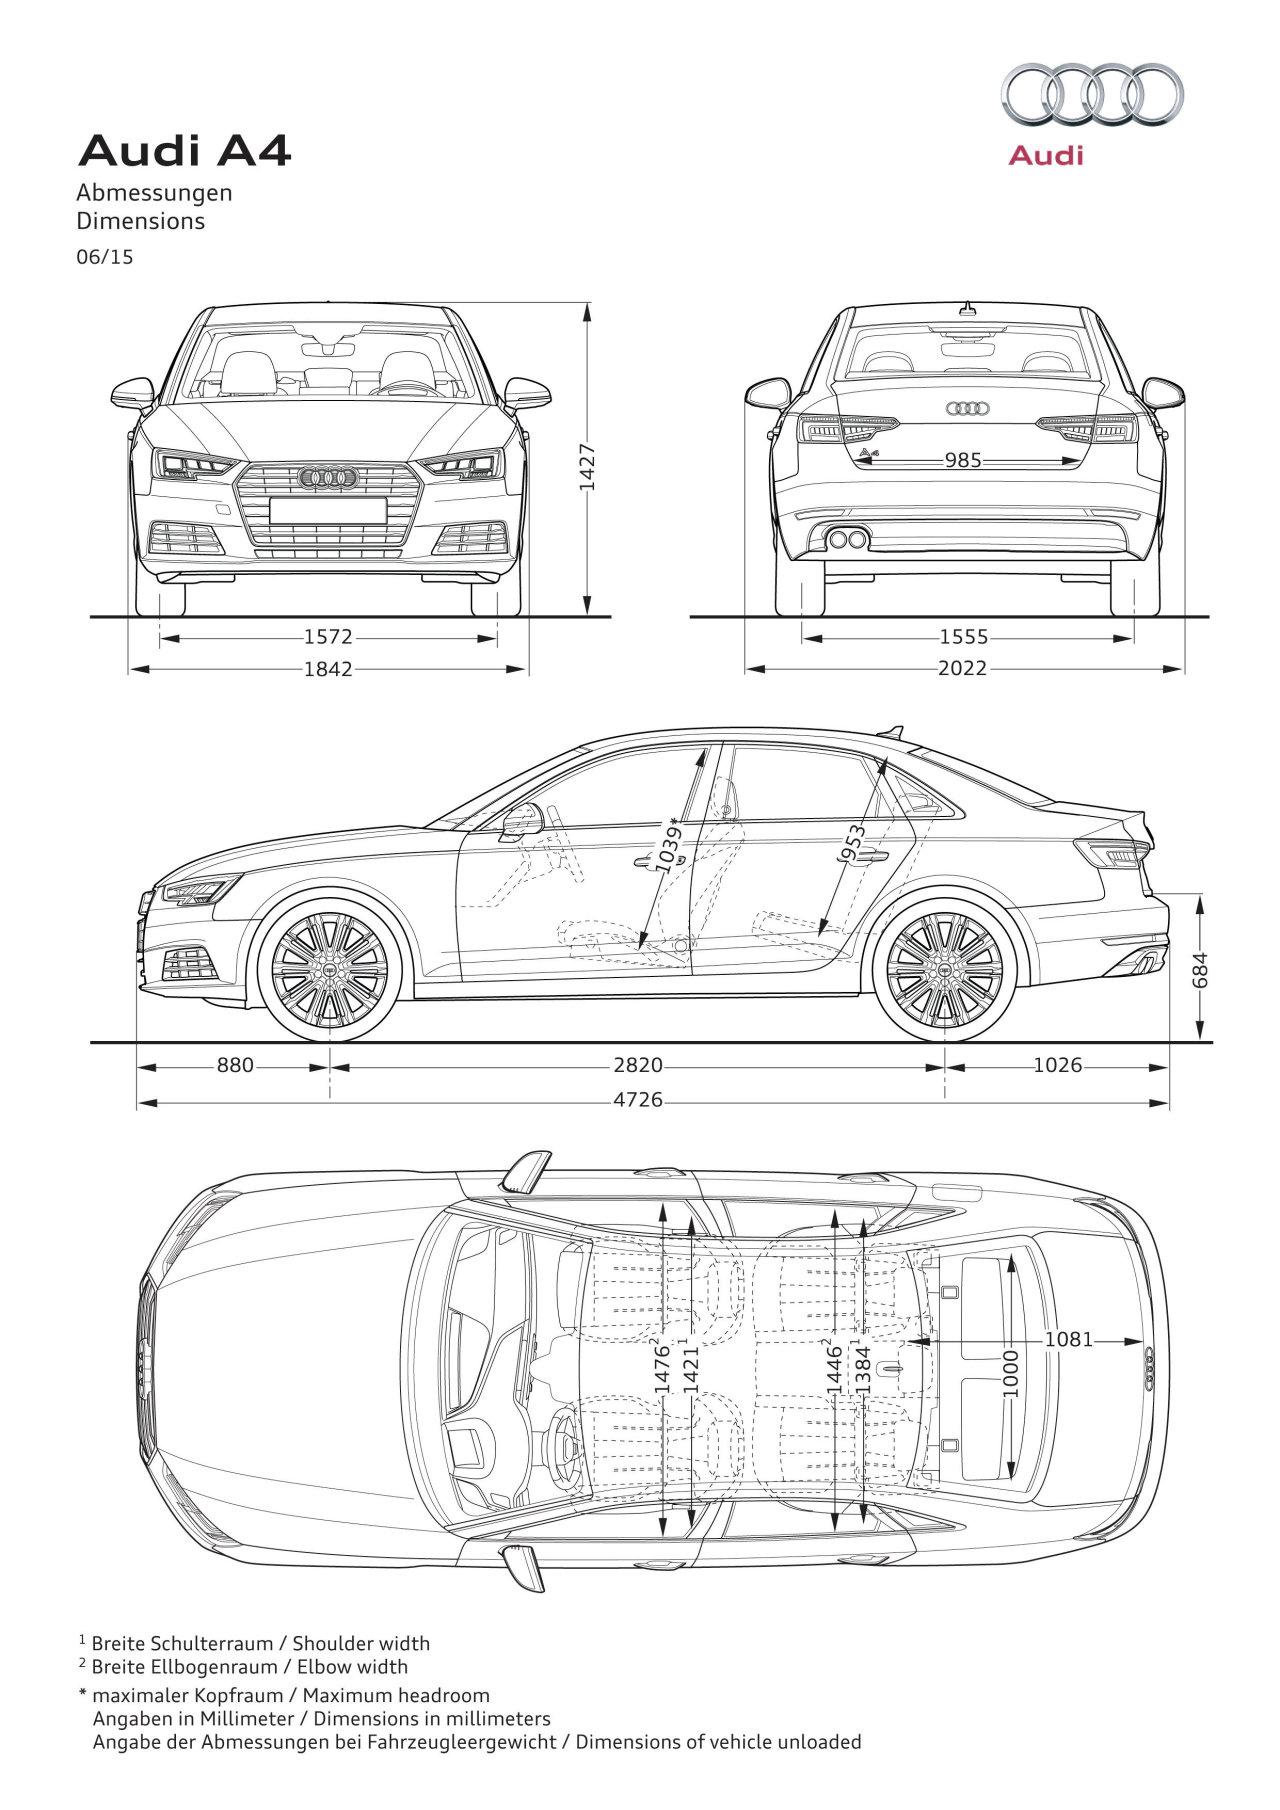 Nouvelles Audi A4 Berline Et Break L Eloge De La